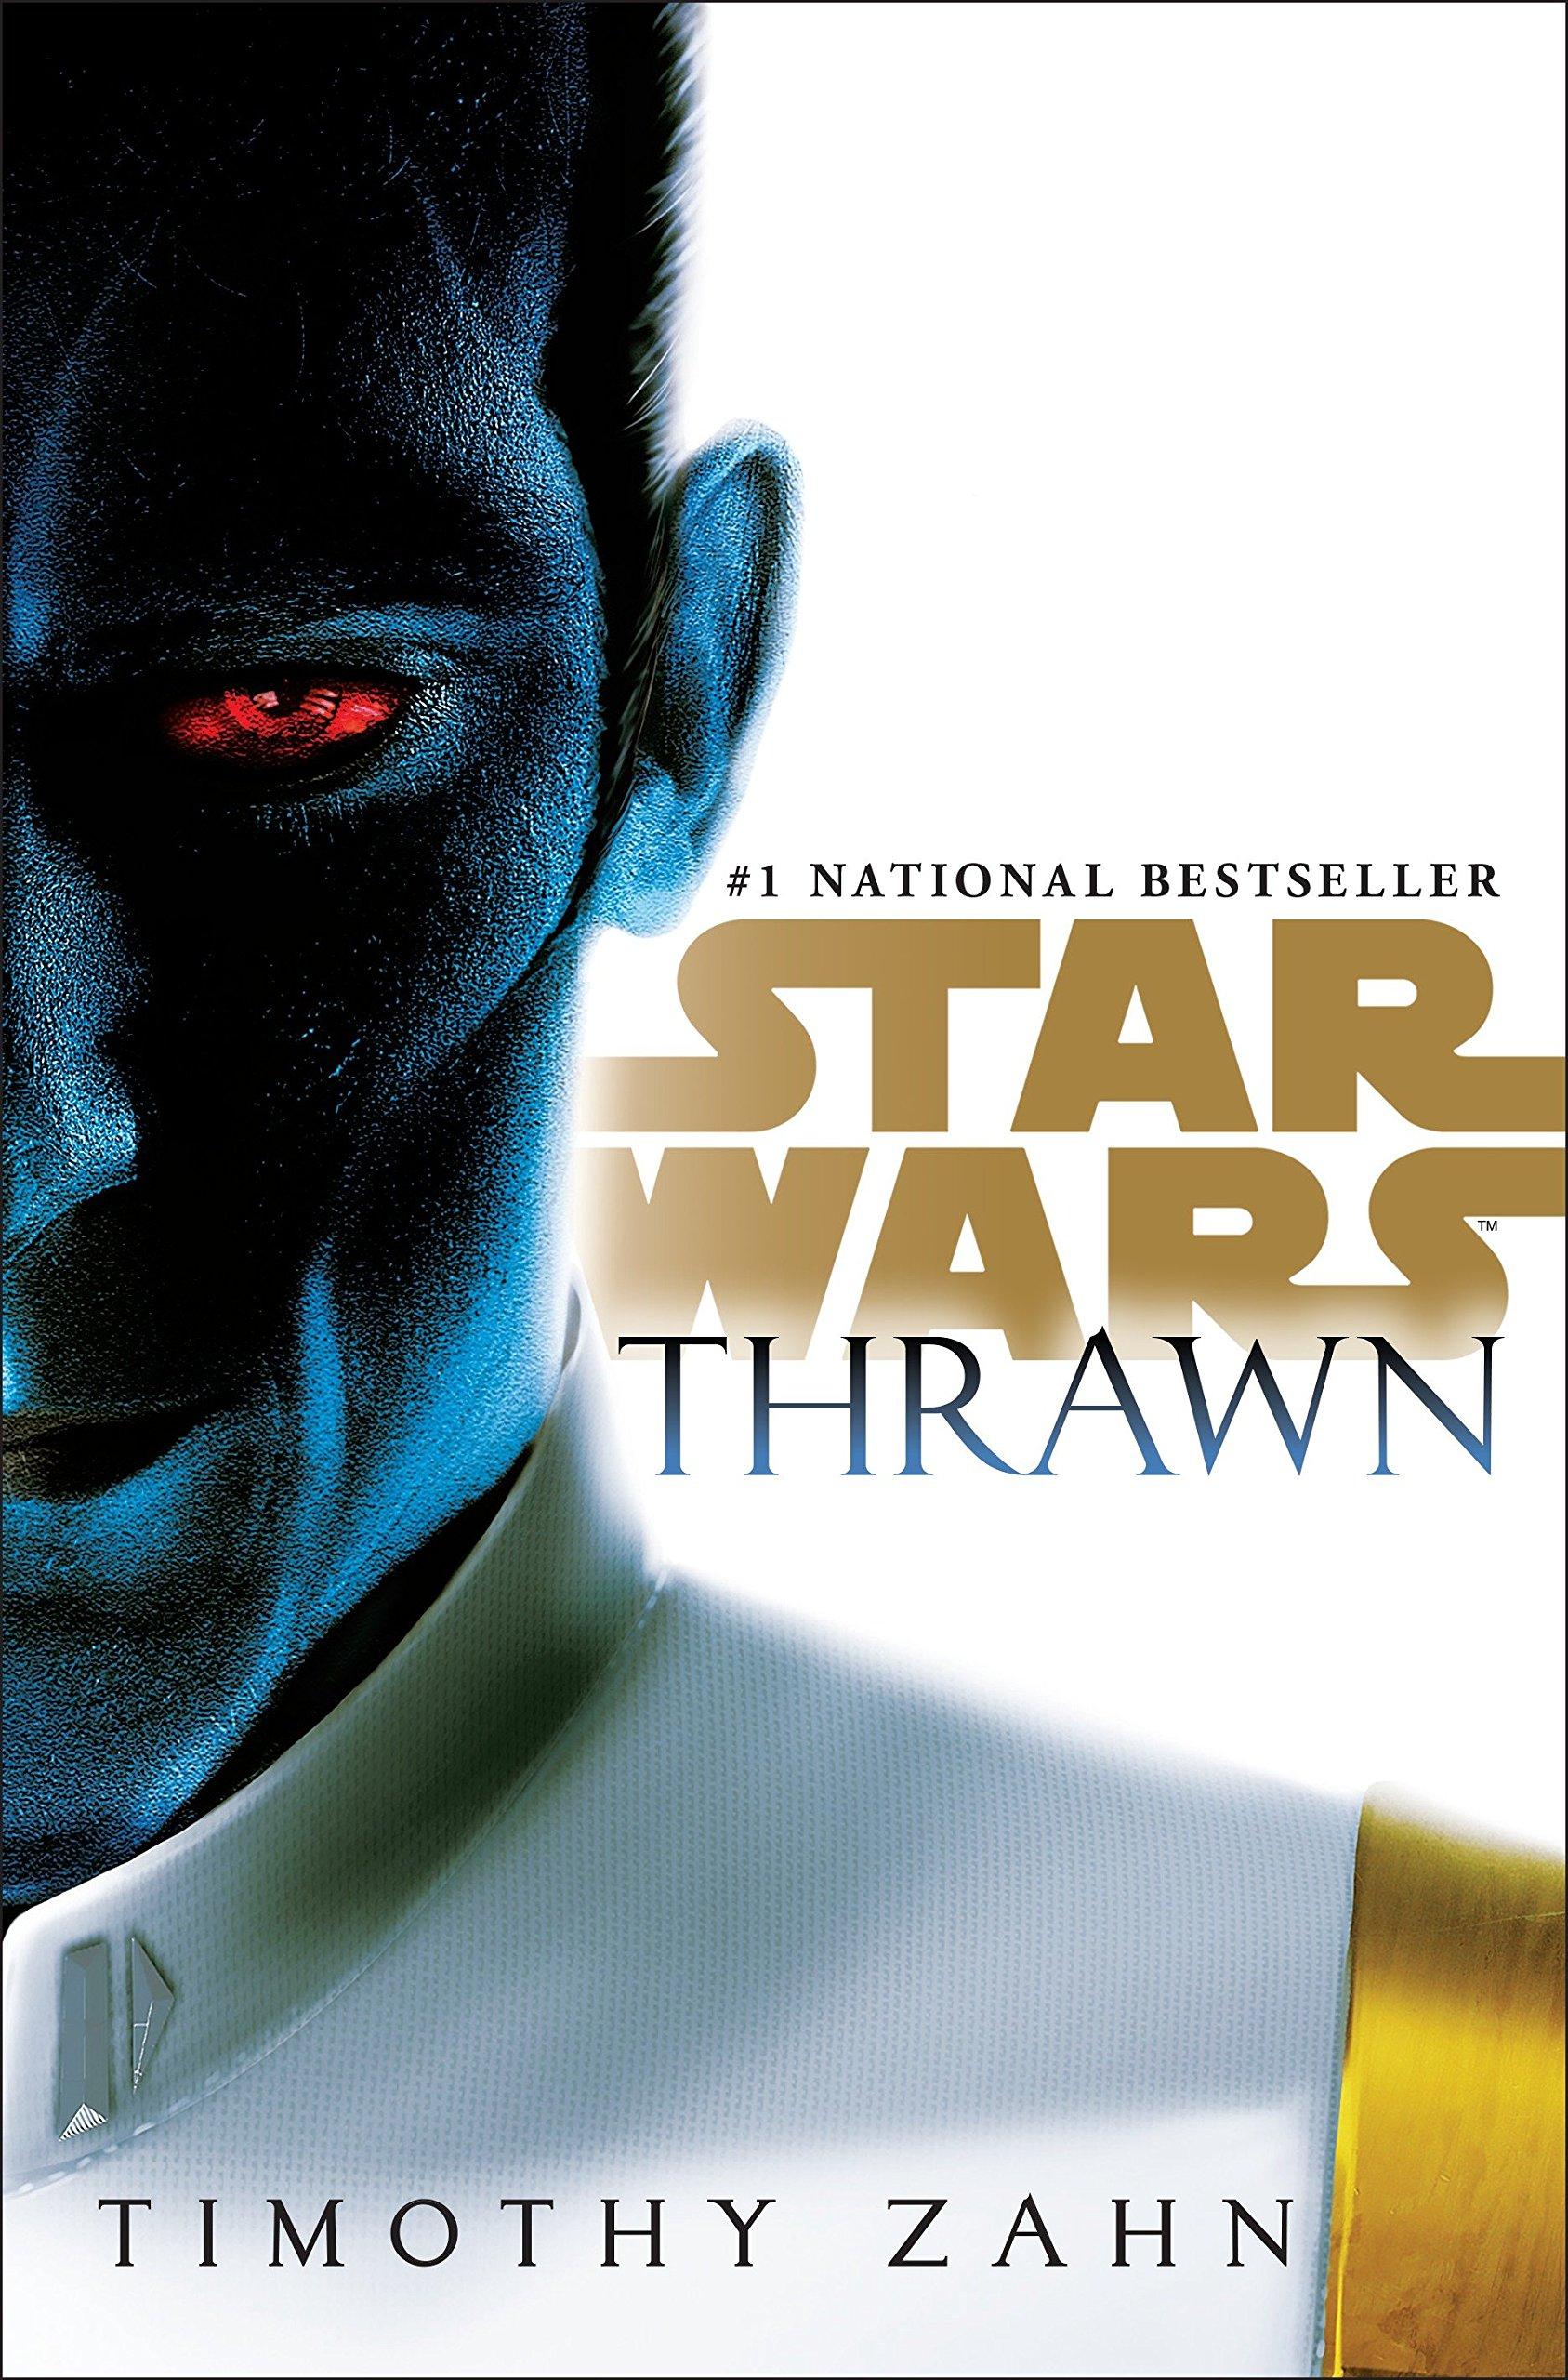 Star Wars: Thrawn (Kindle Edition) by Timothy Zahn £1.99 @ Amazon